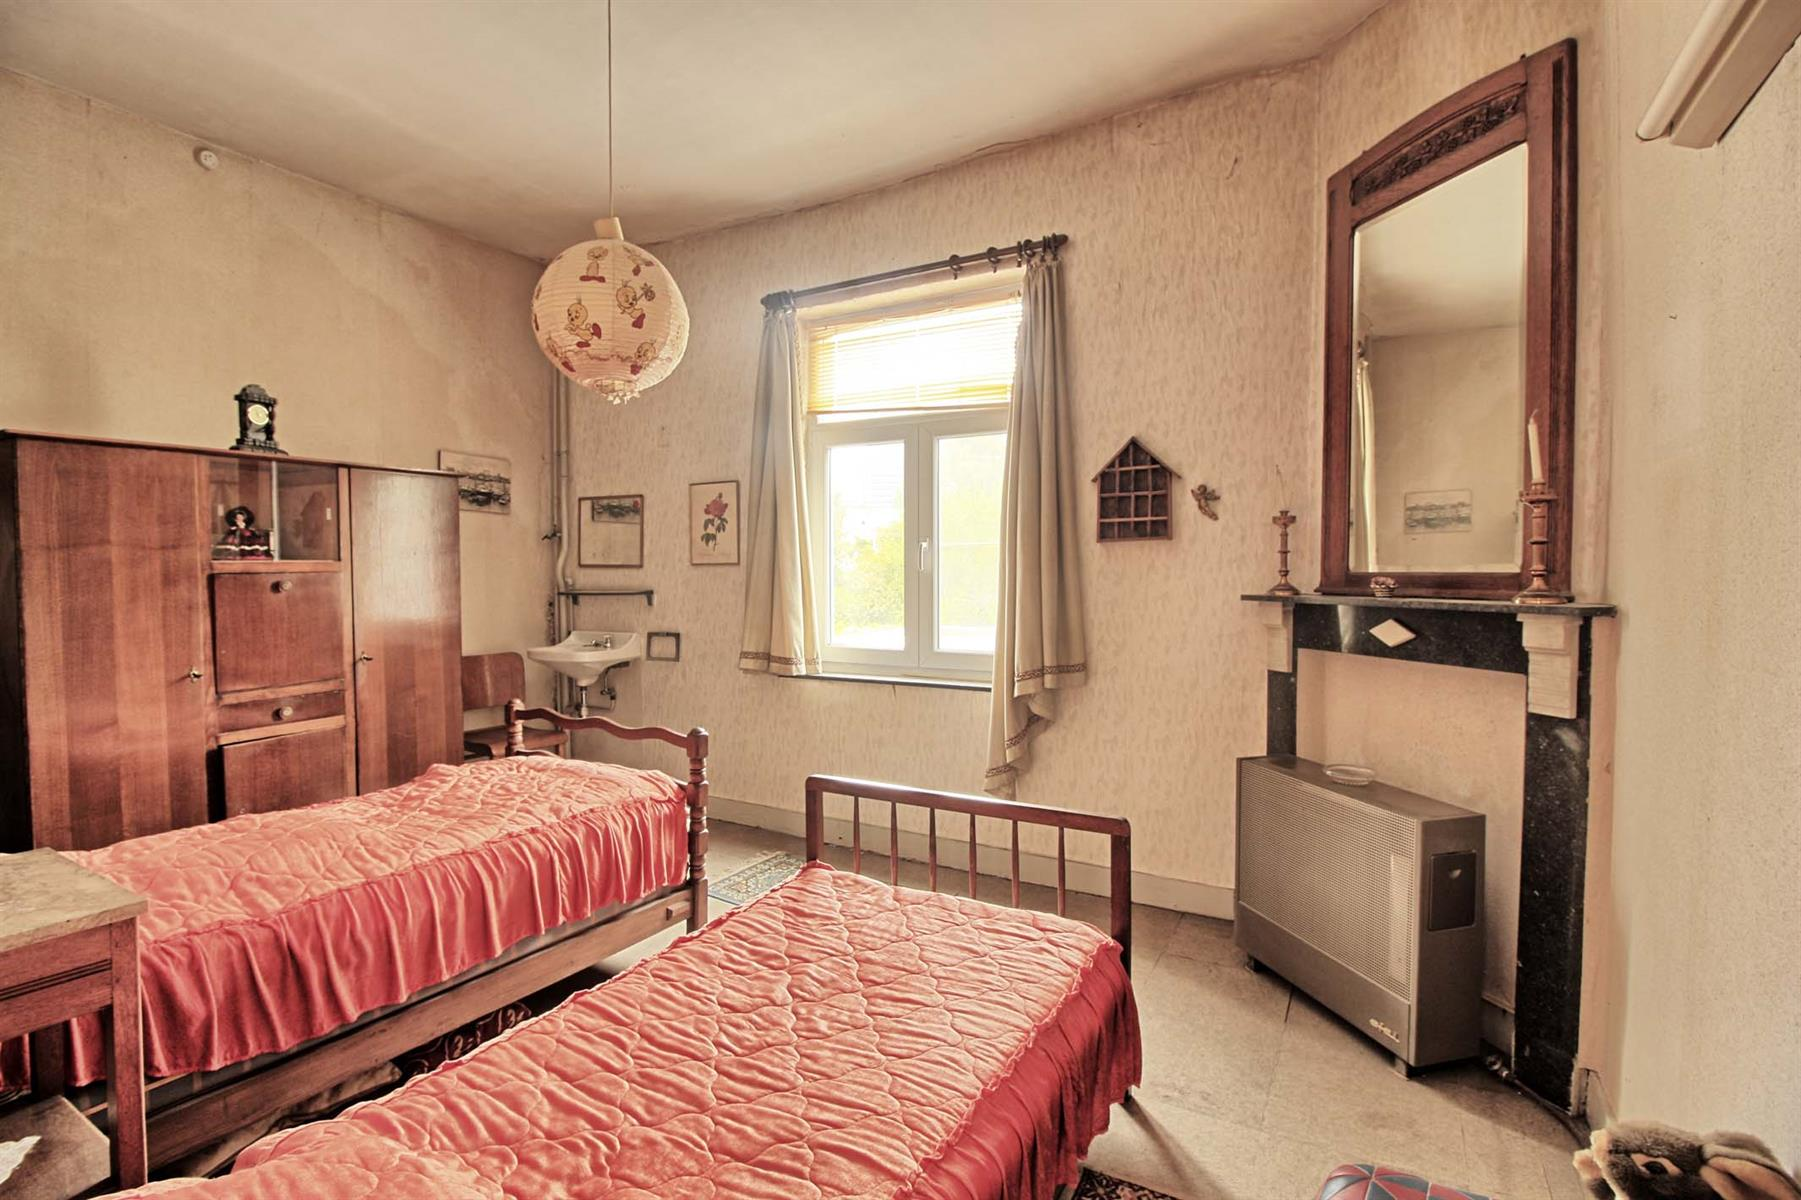 Eengezinswoning - Woluwe-Saint-Lambert - #4106876-8